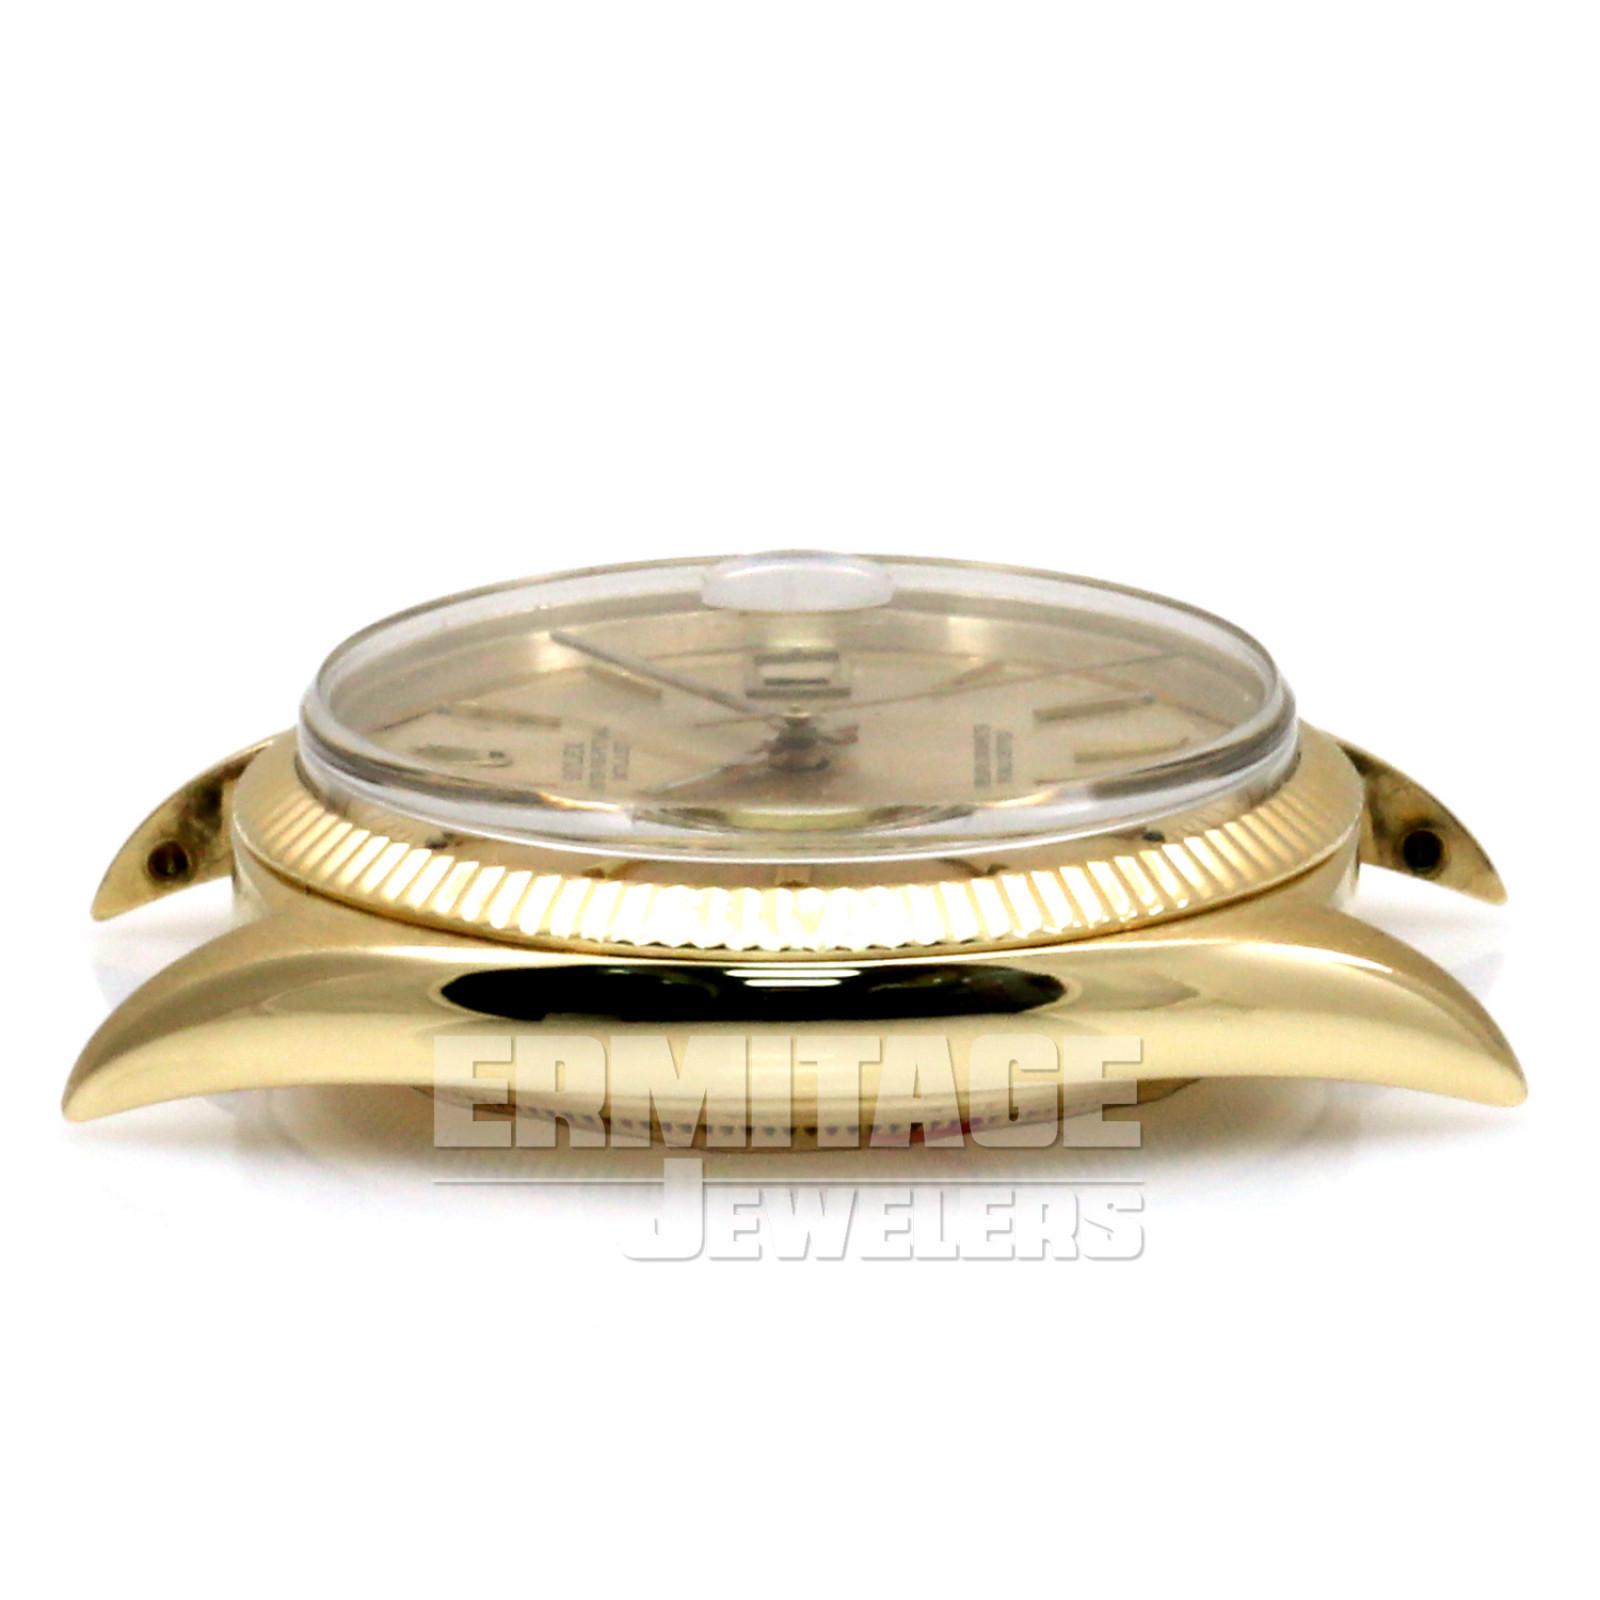 Vintage Rolex 1601 36 mm Yellow Gold President